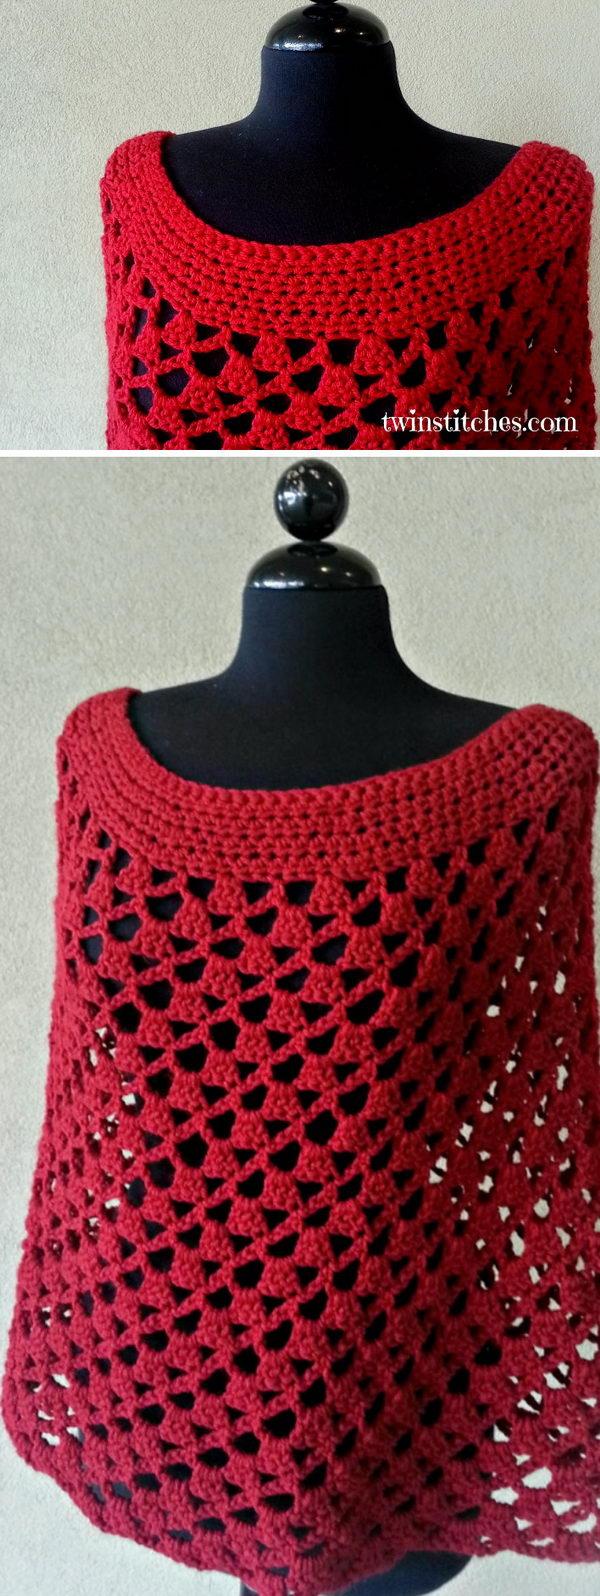 Crochet Scarlett Spiral Poncho.